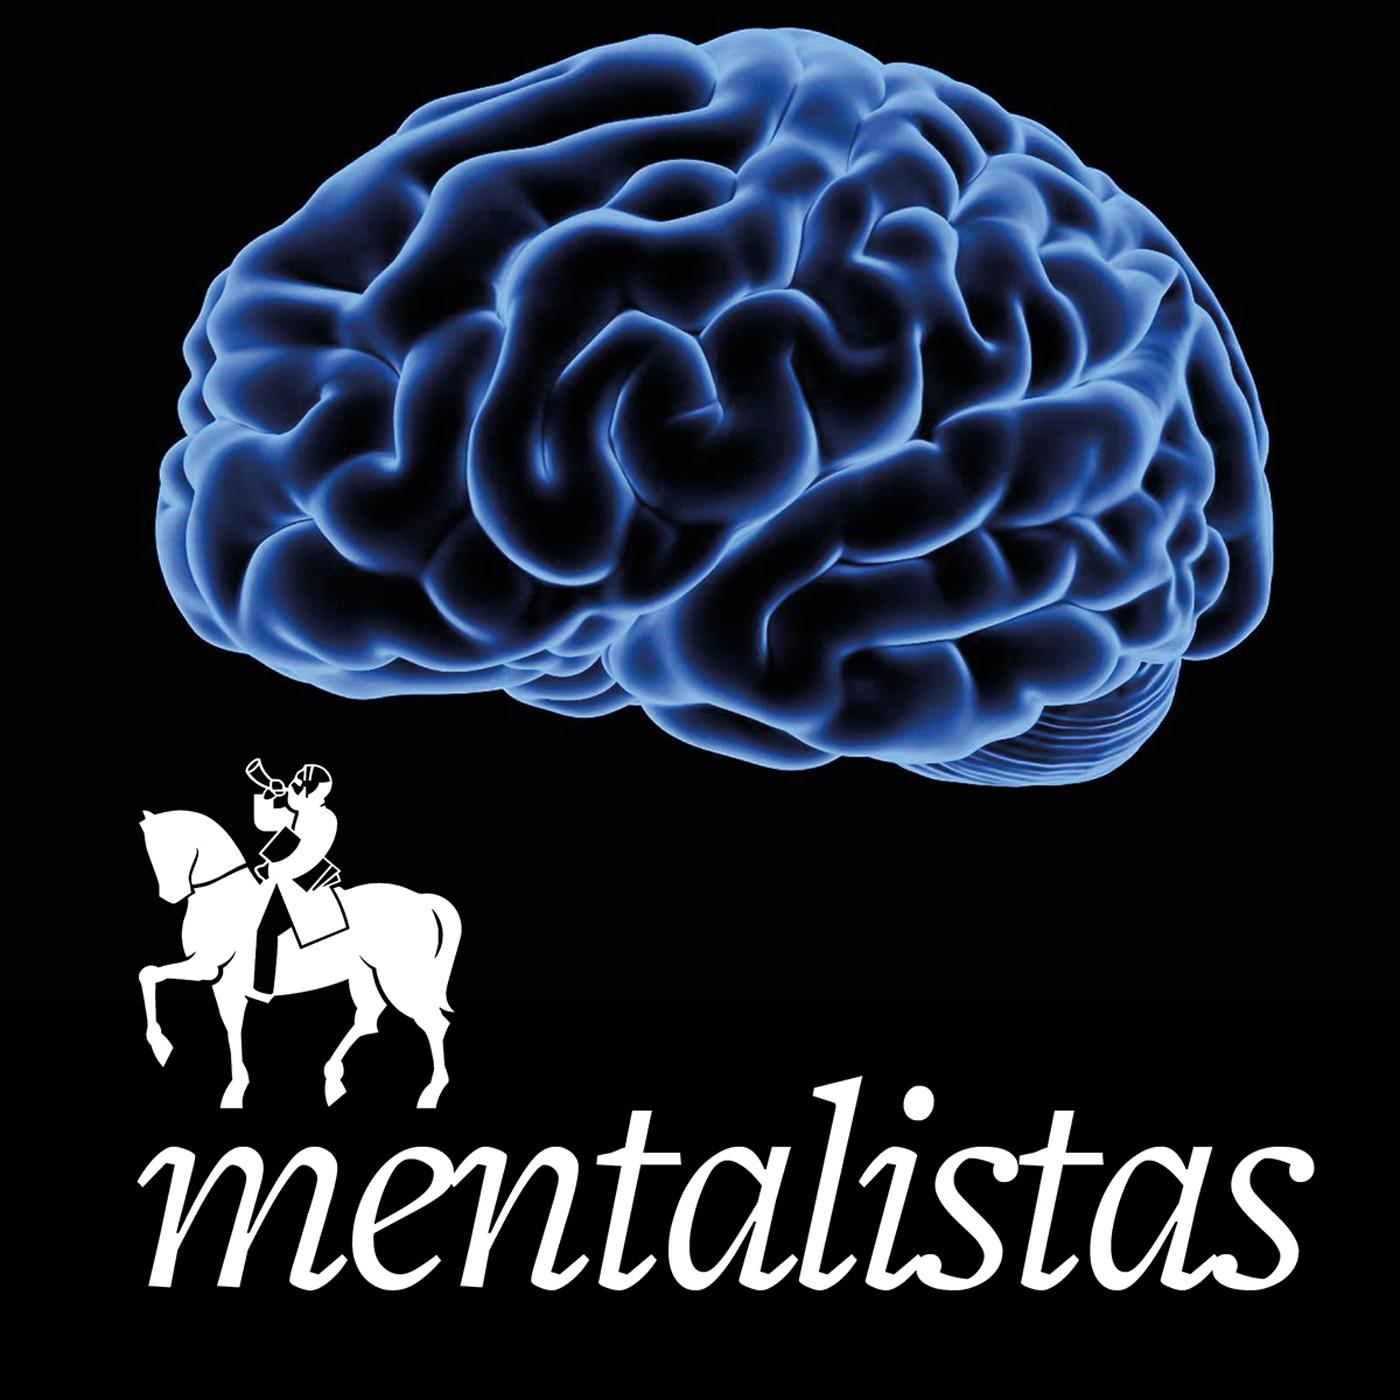 Mentalistas 09.05.17